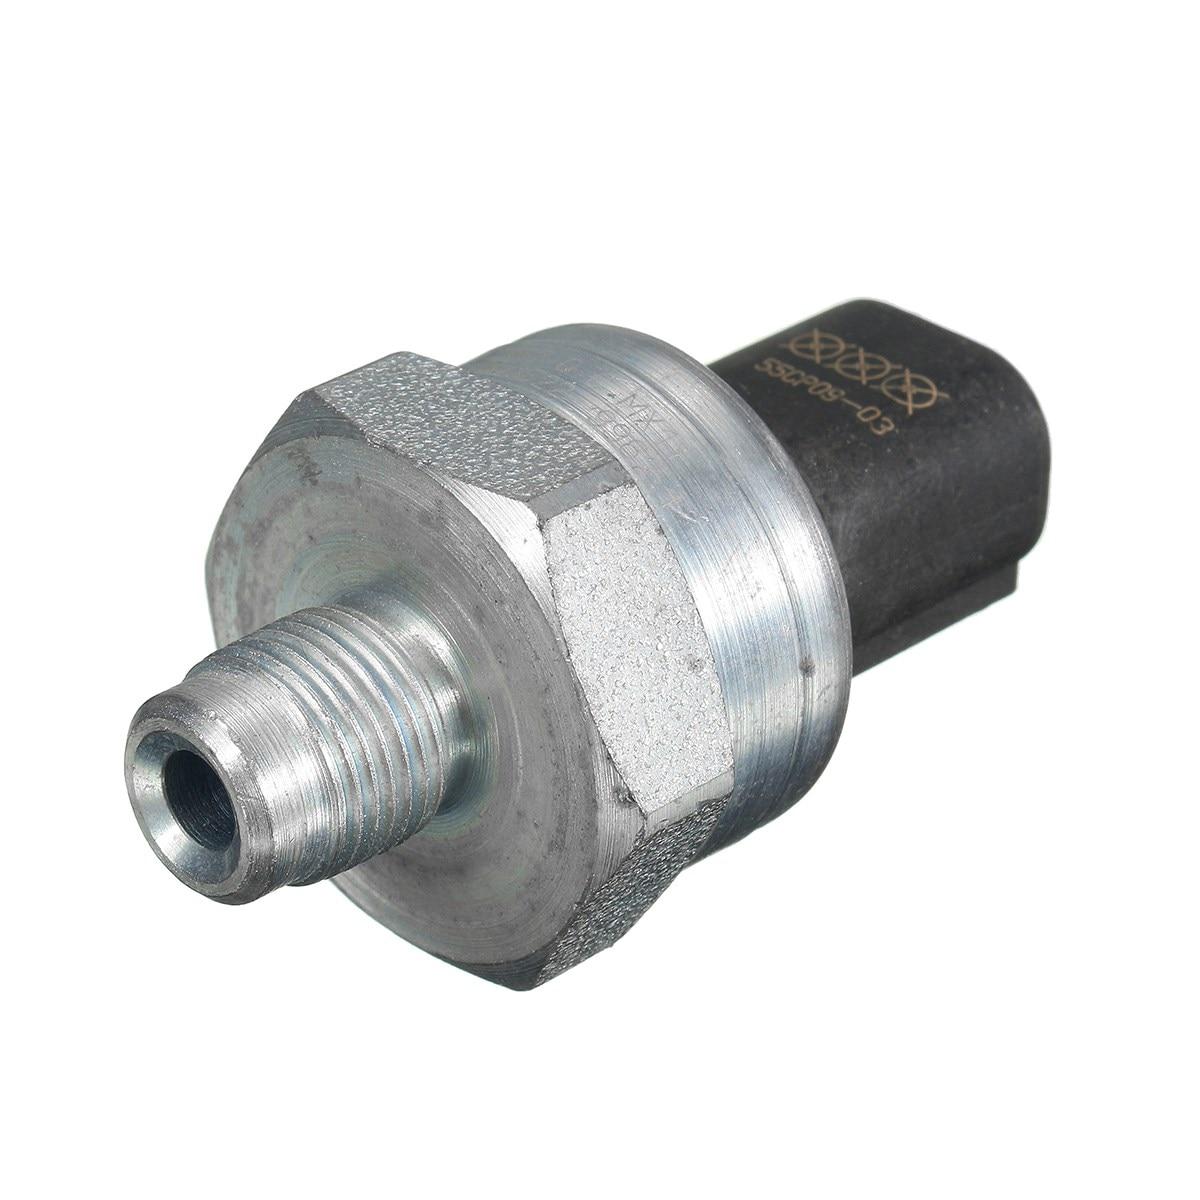 DSC Brake Pressure Sensor Switch For BMW E46 E60 E61 E63 E64 Z3 Z4 34521164458